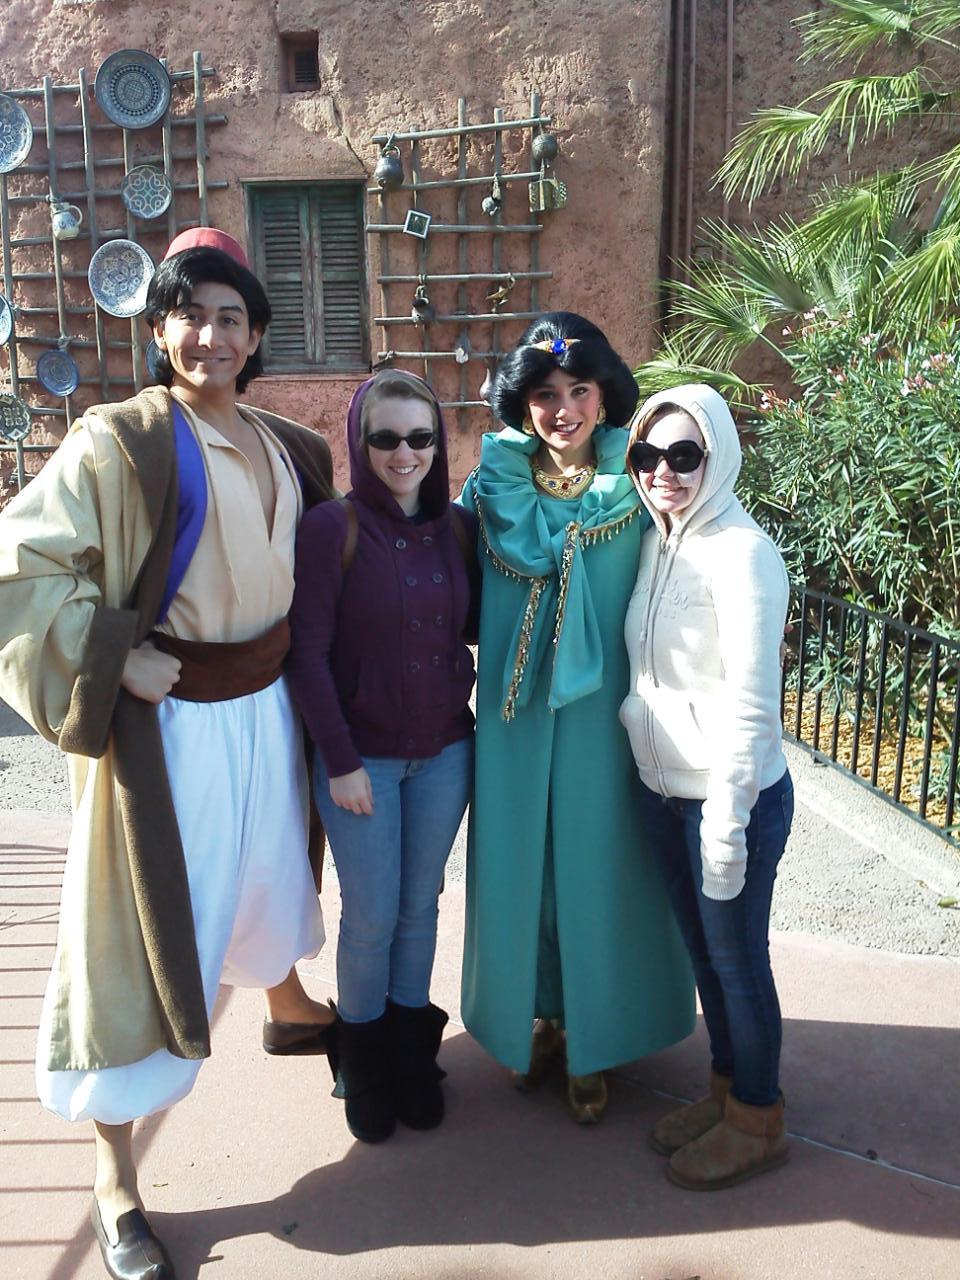 Meeting Aladdin and Jasmine at W.D.W!